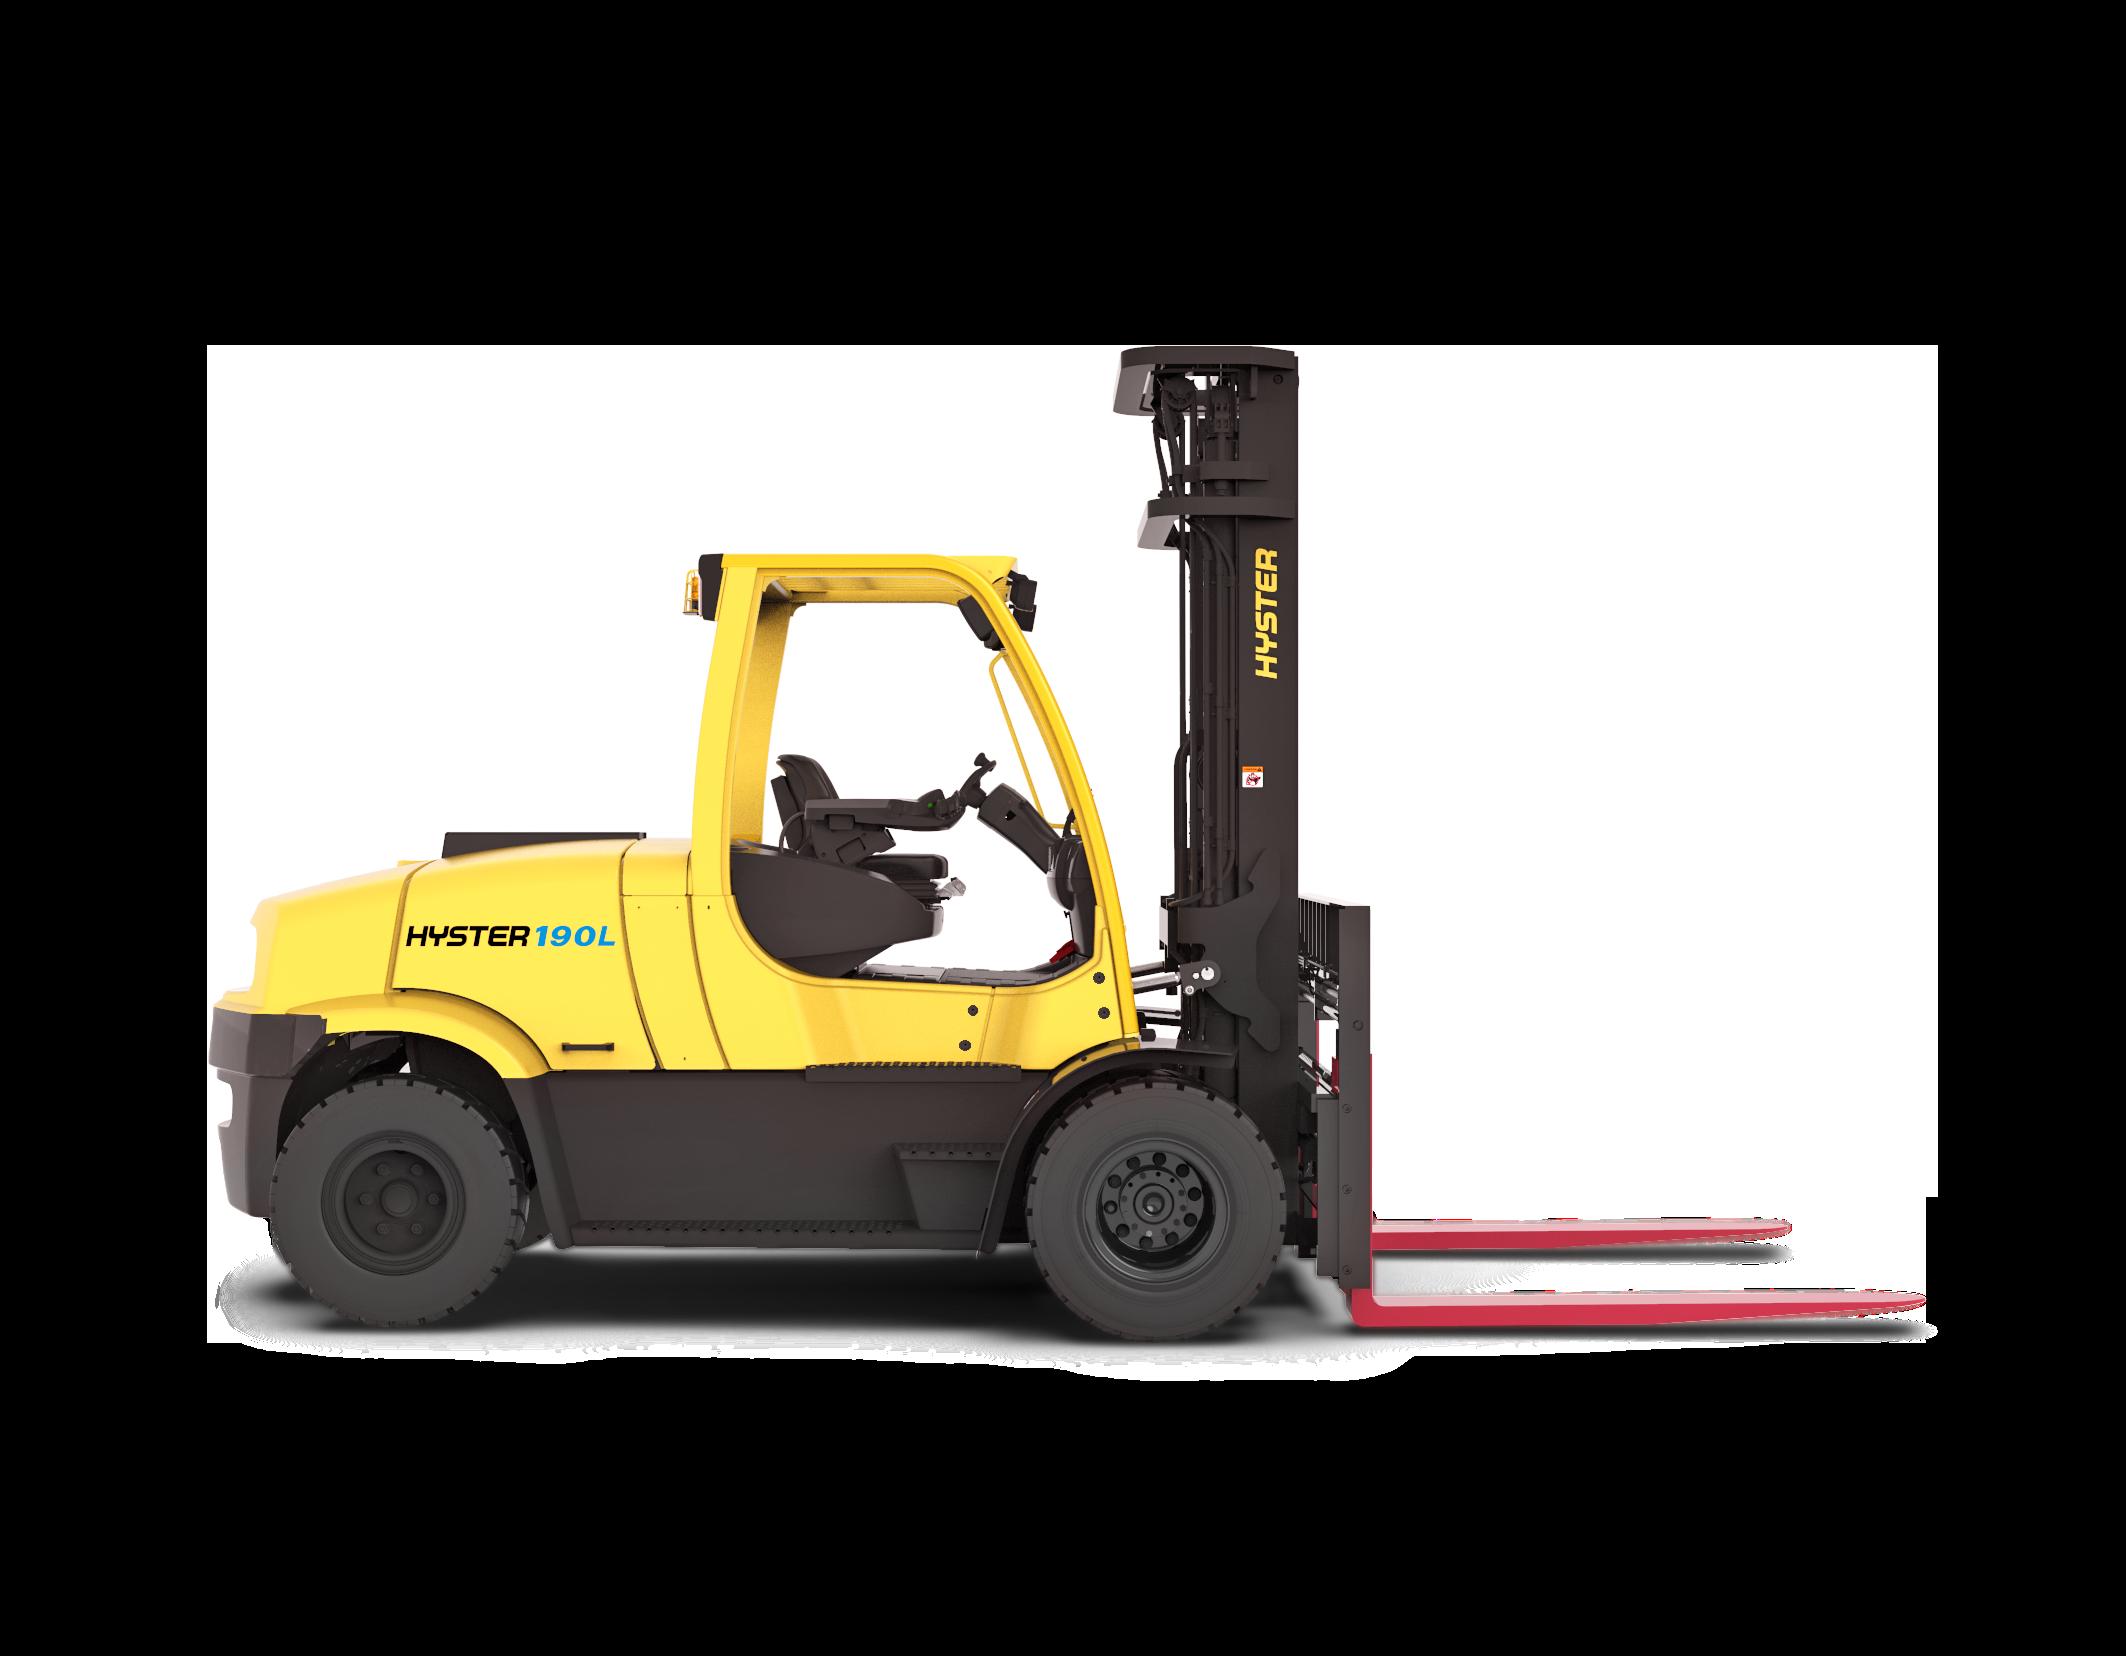 J155-190XNL 4 Wheel Electric Forklift